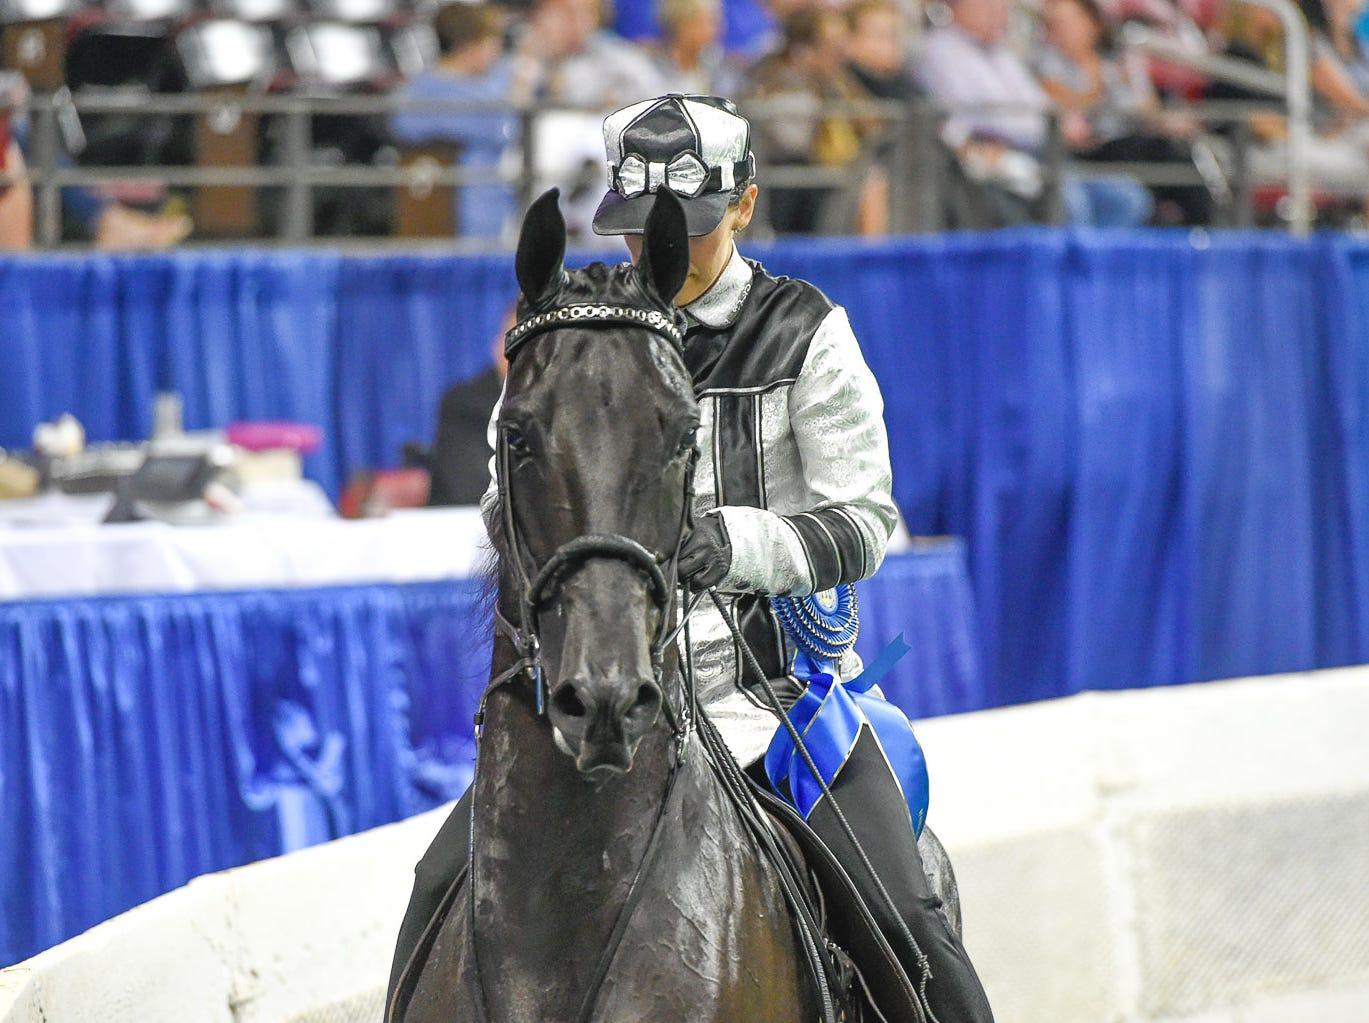 Road Horse under saddle winner Smoke Stack with trainer Megan Thibo for owner Garry Brumm